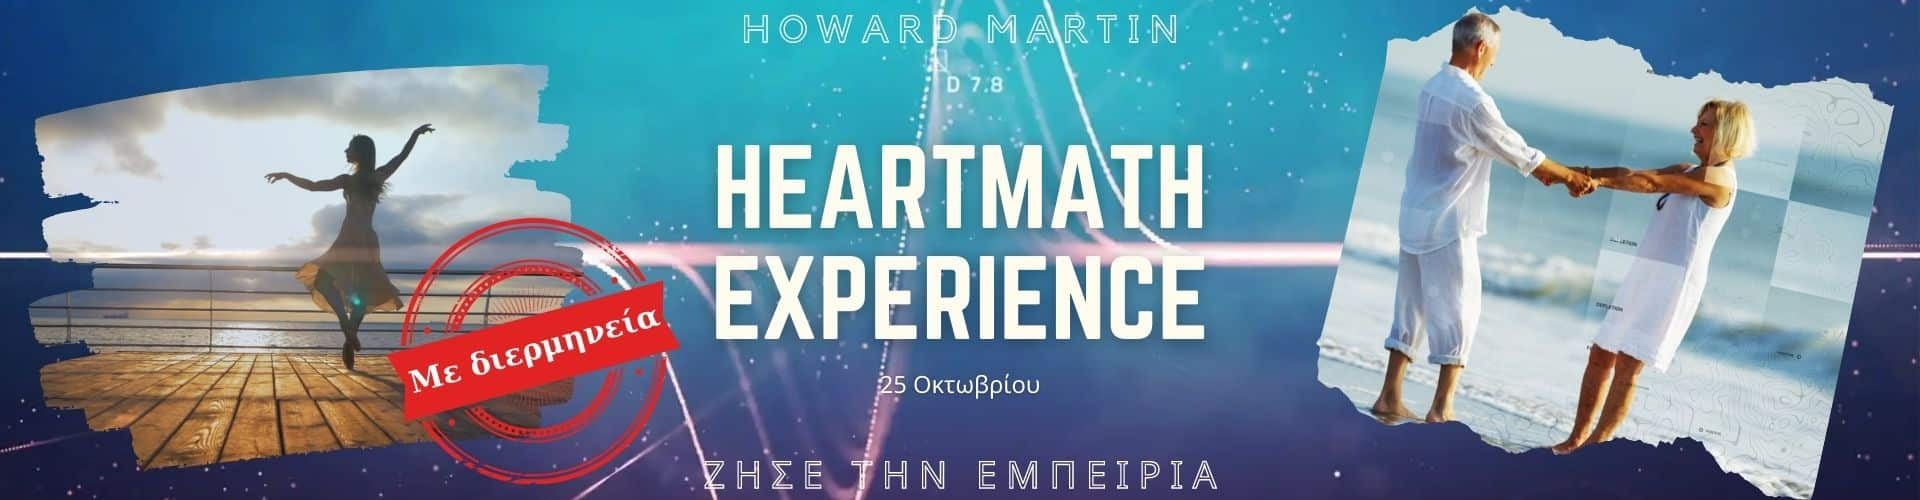 heart54647